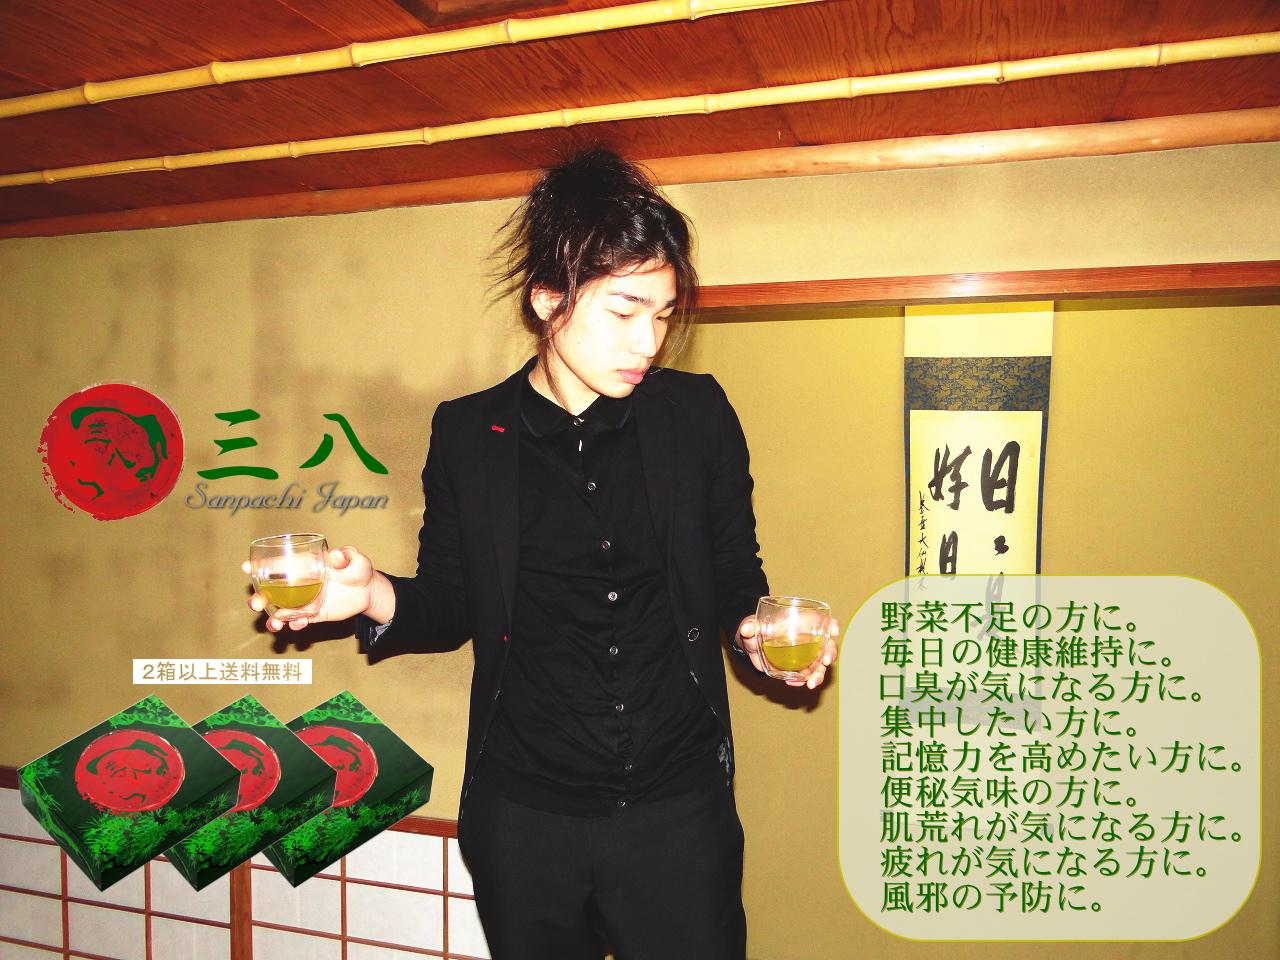 三八 さんぱち 高級青汁 抹茶青汁 緑茶青汁 大麦若葉 九州産 八女産 無添加青汁